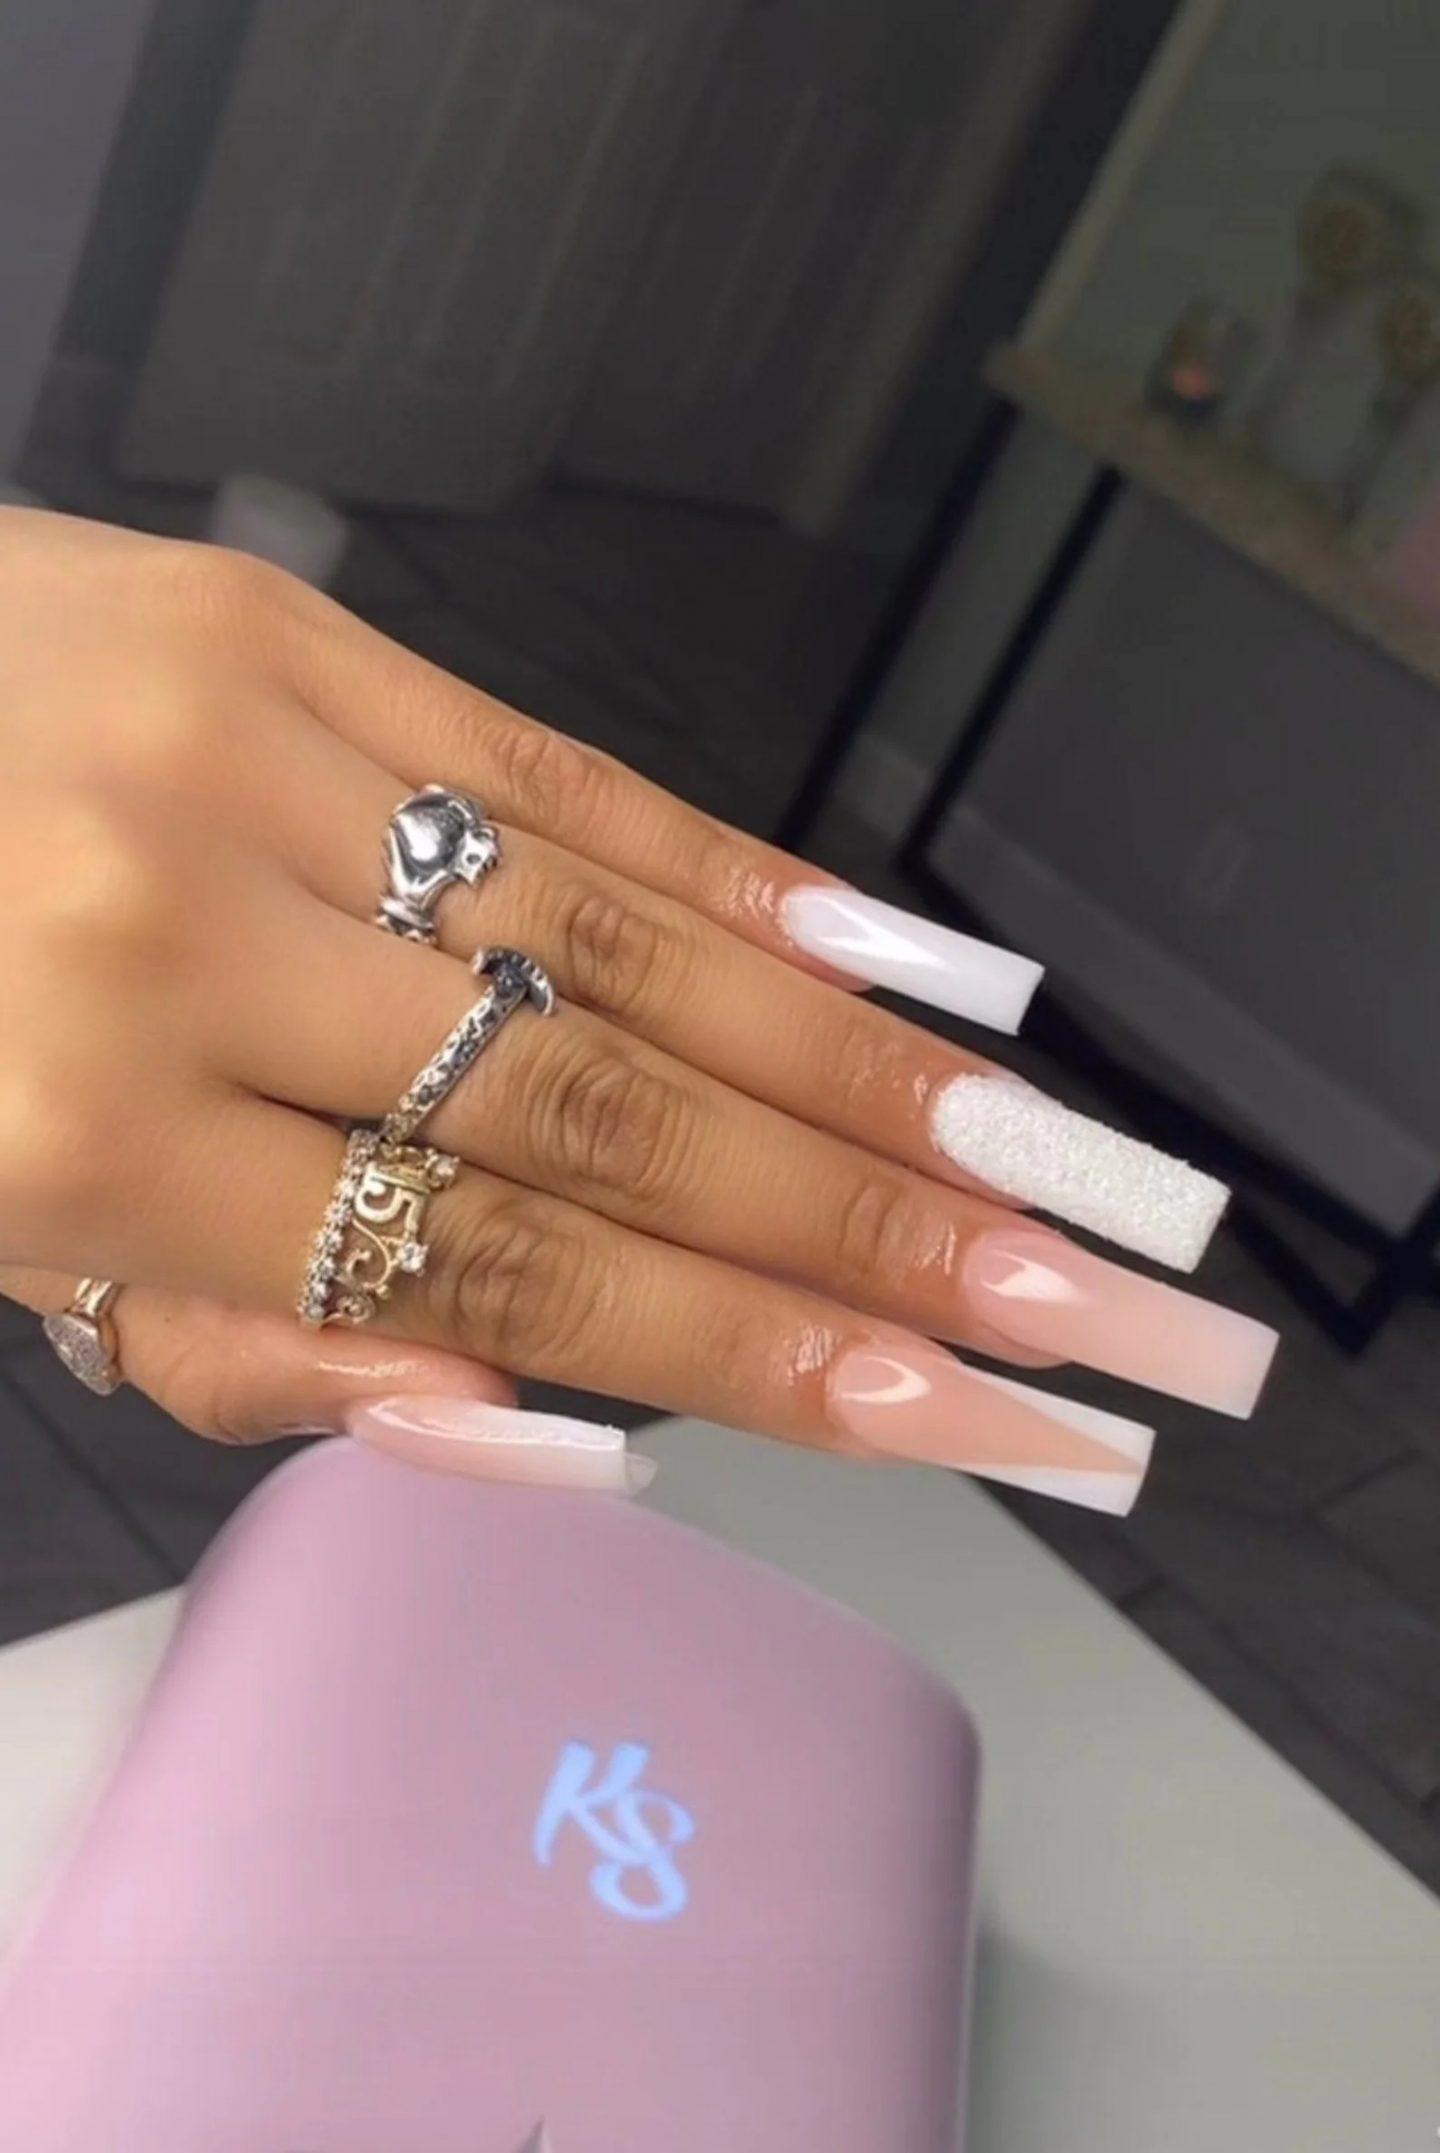 Glamorous white and French tip birthday nails with rhinestones